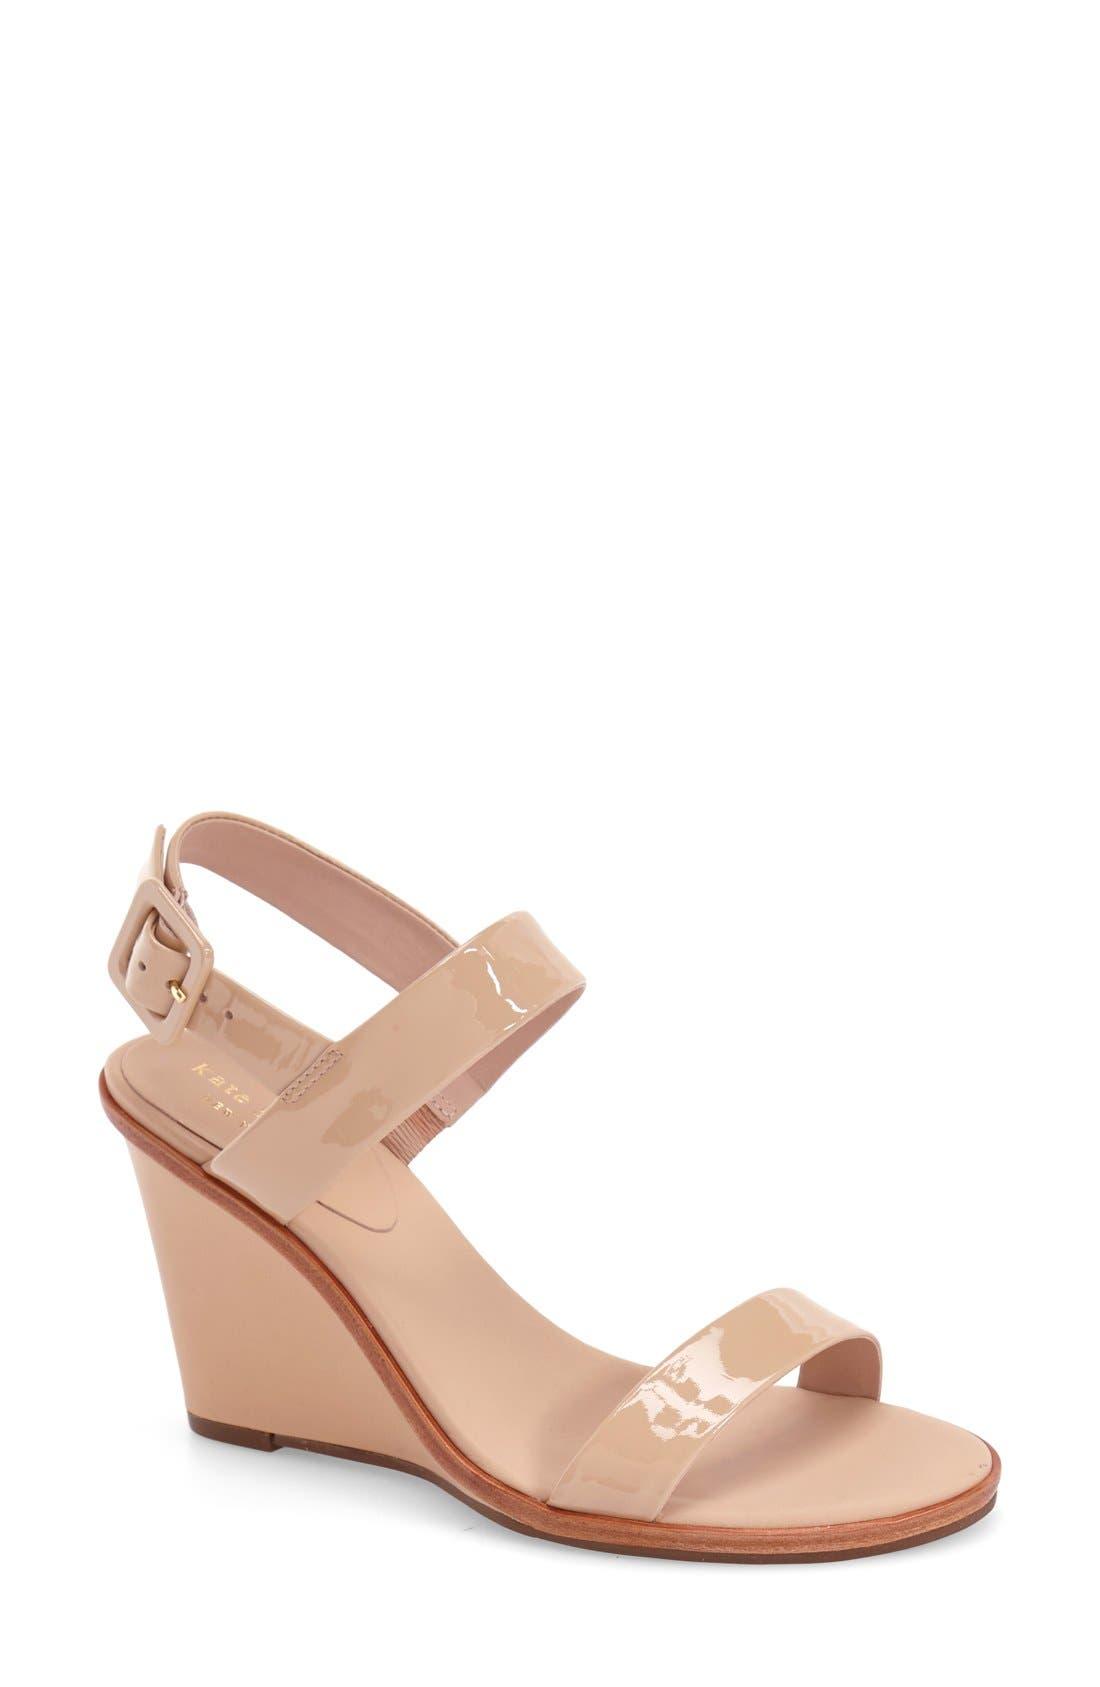 Main Image - kate spade new york 'nice' sandal (Women)